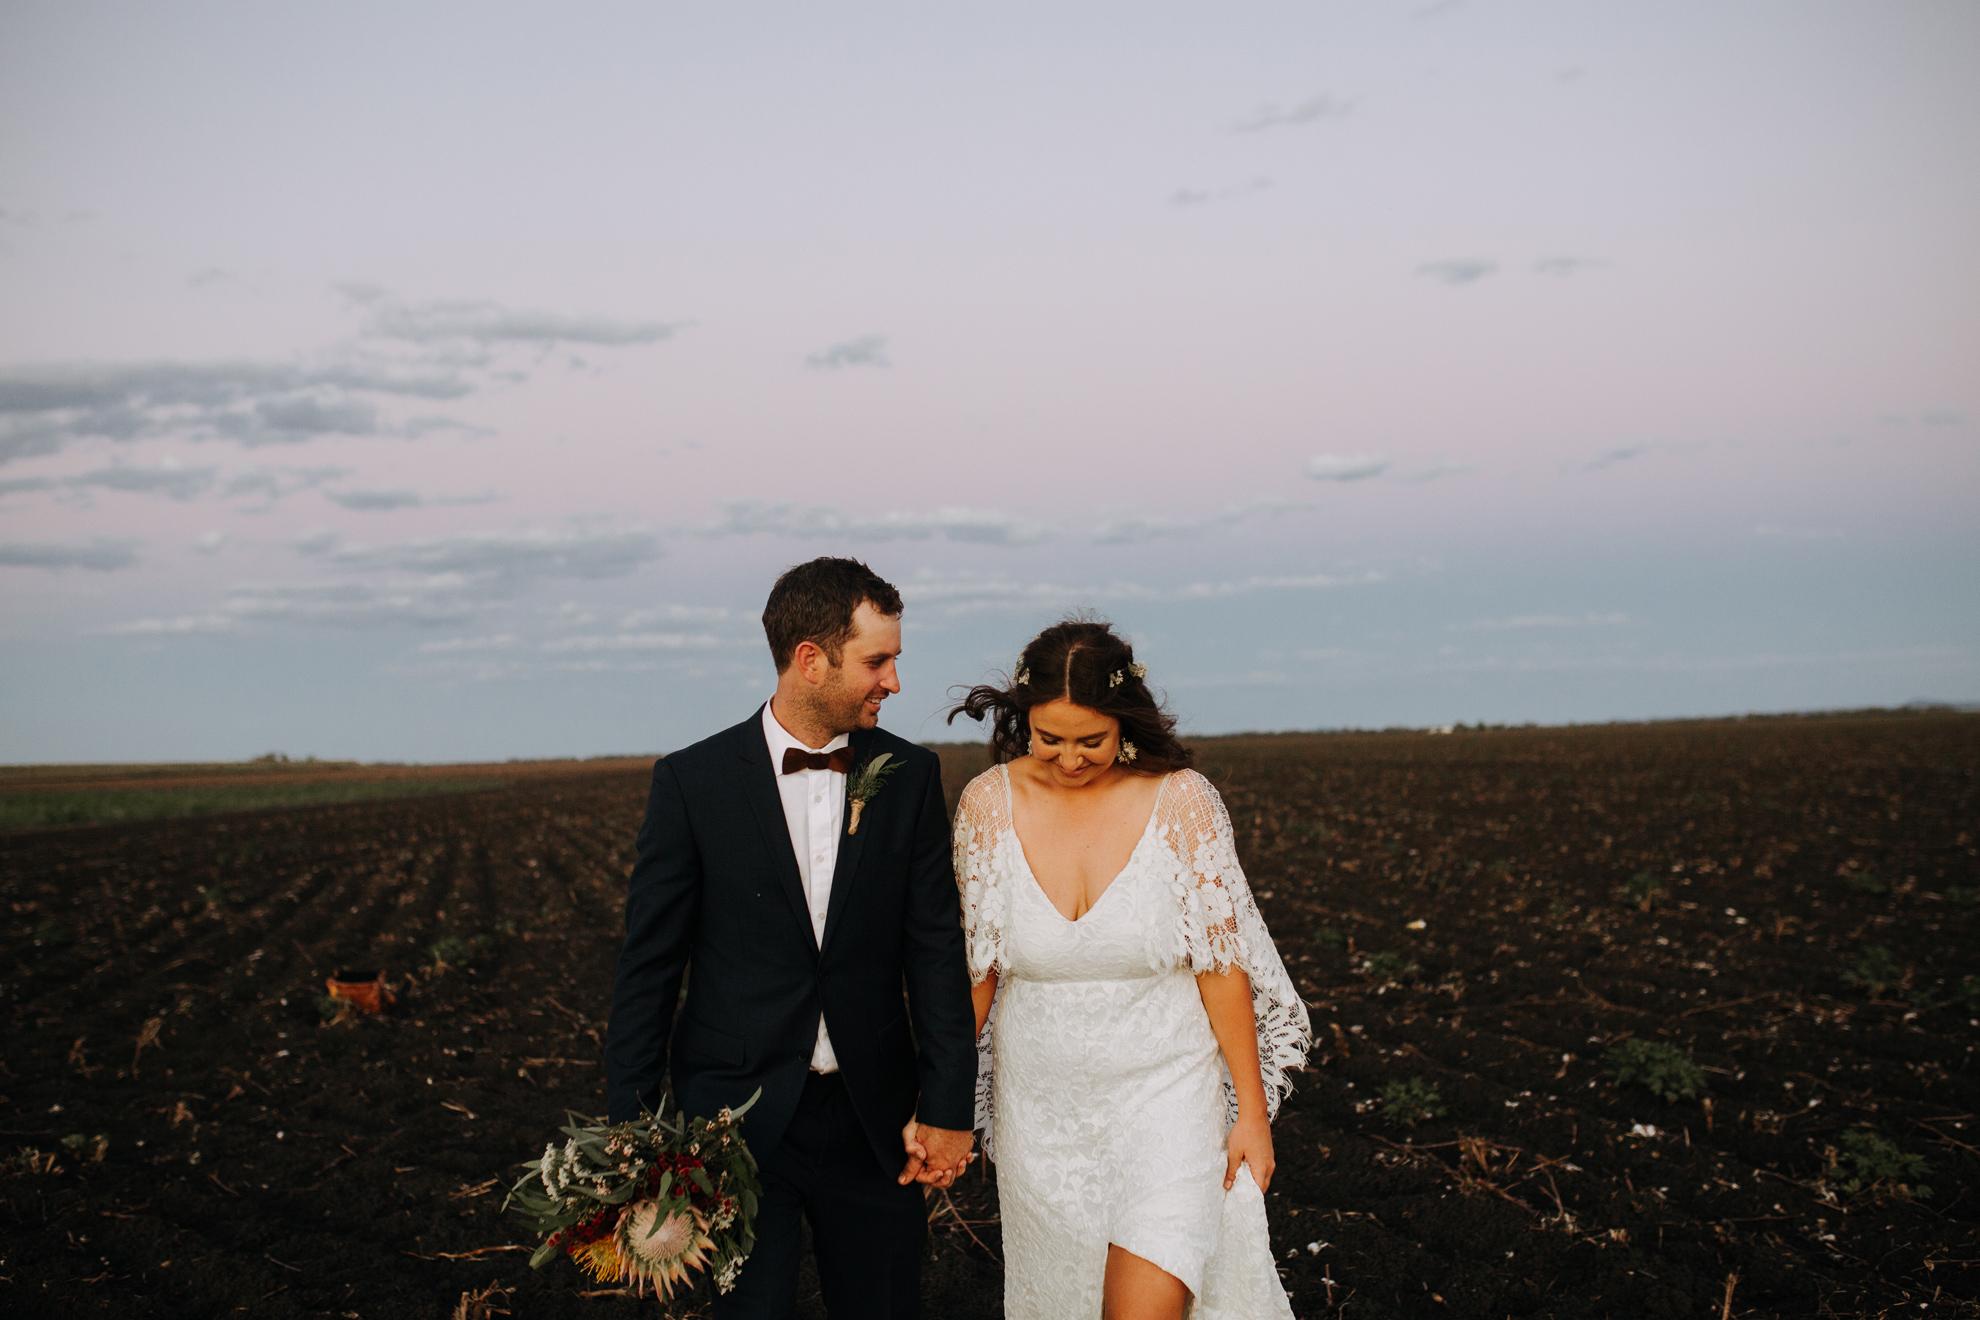 080-Jason_Jessie_Dalby_Country_Wedding.jpg